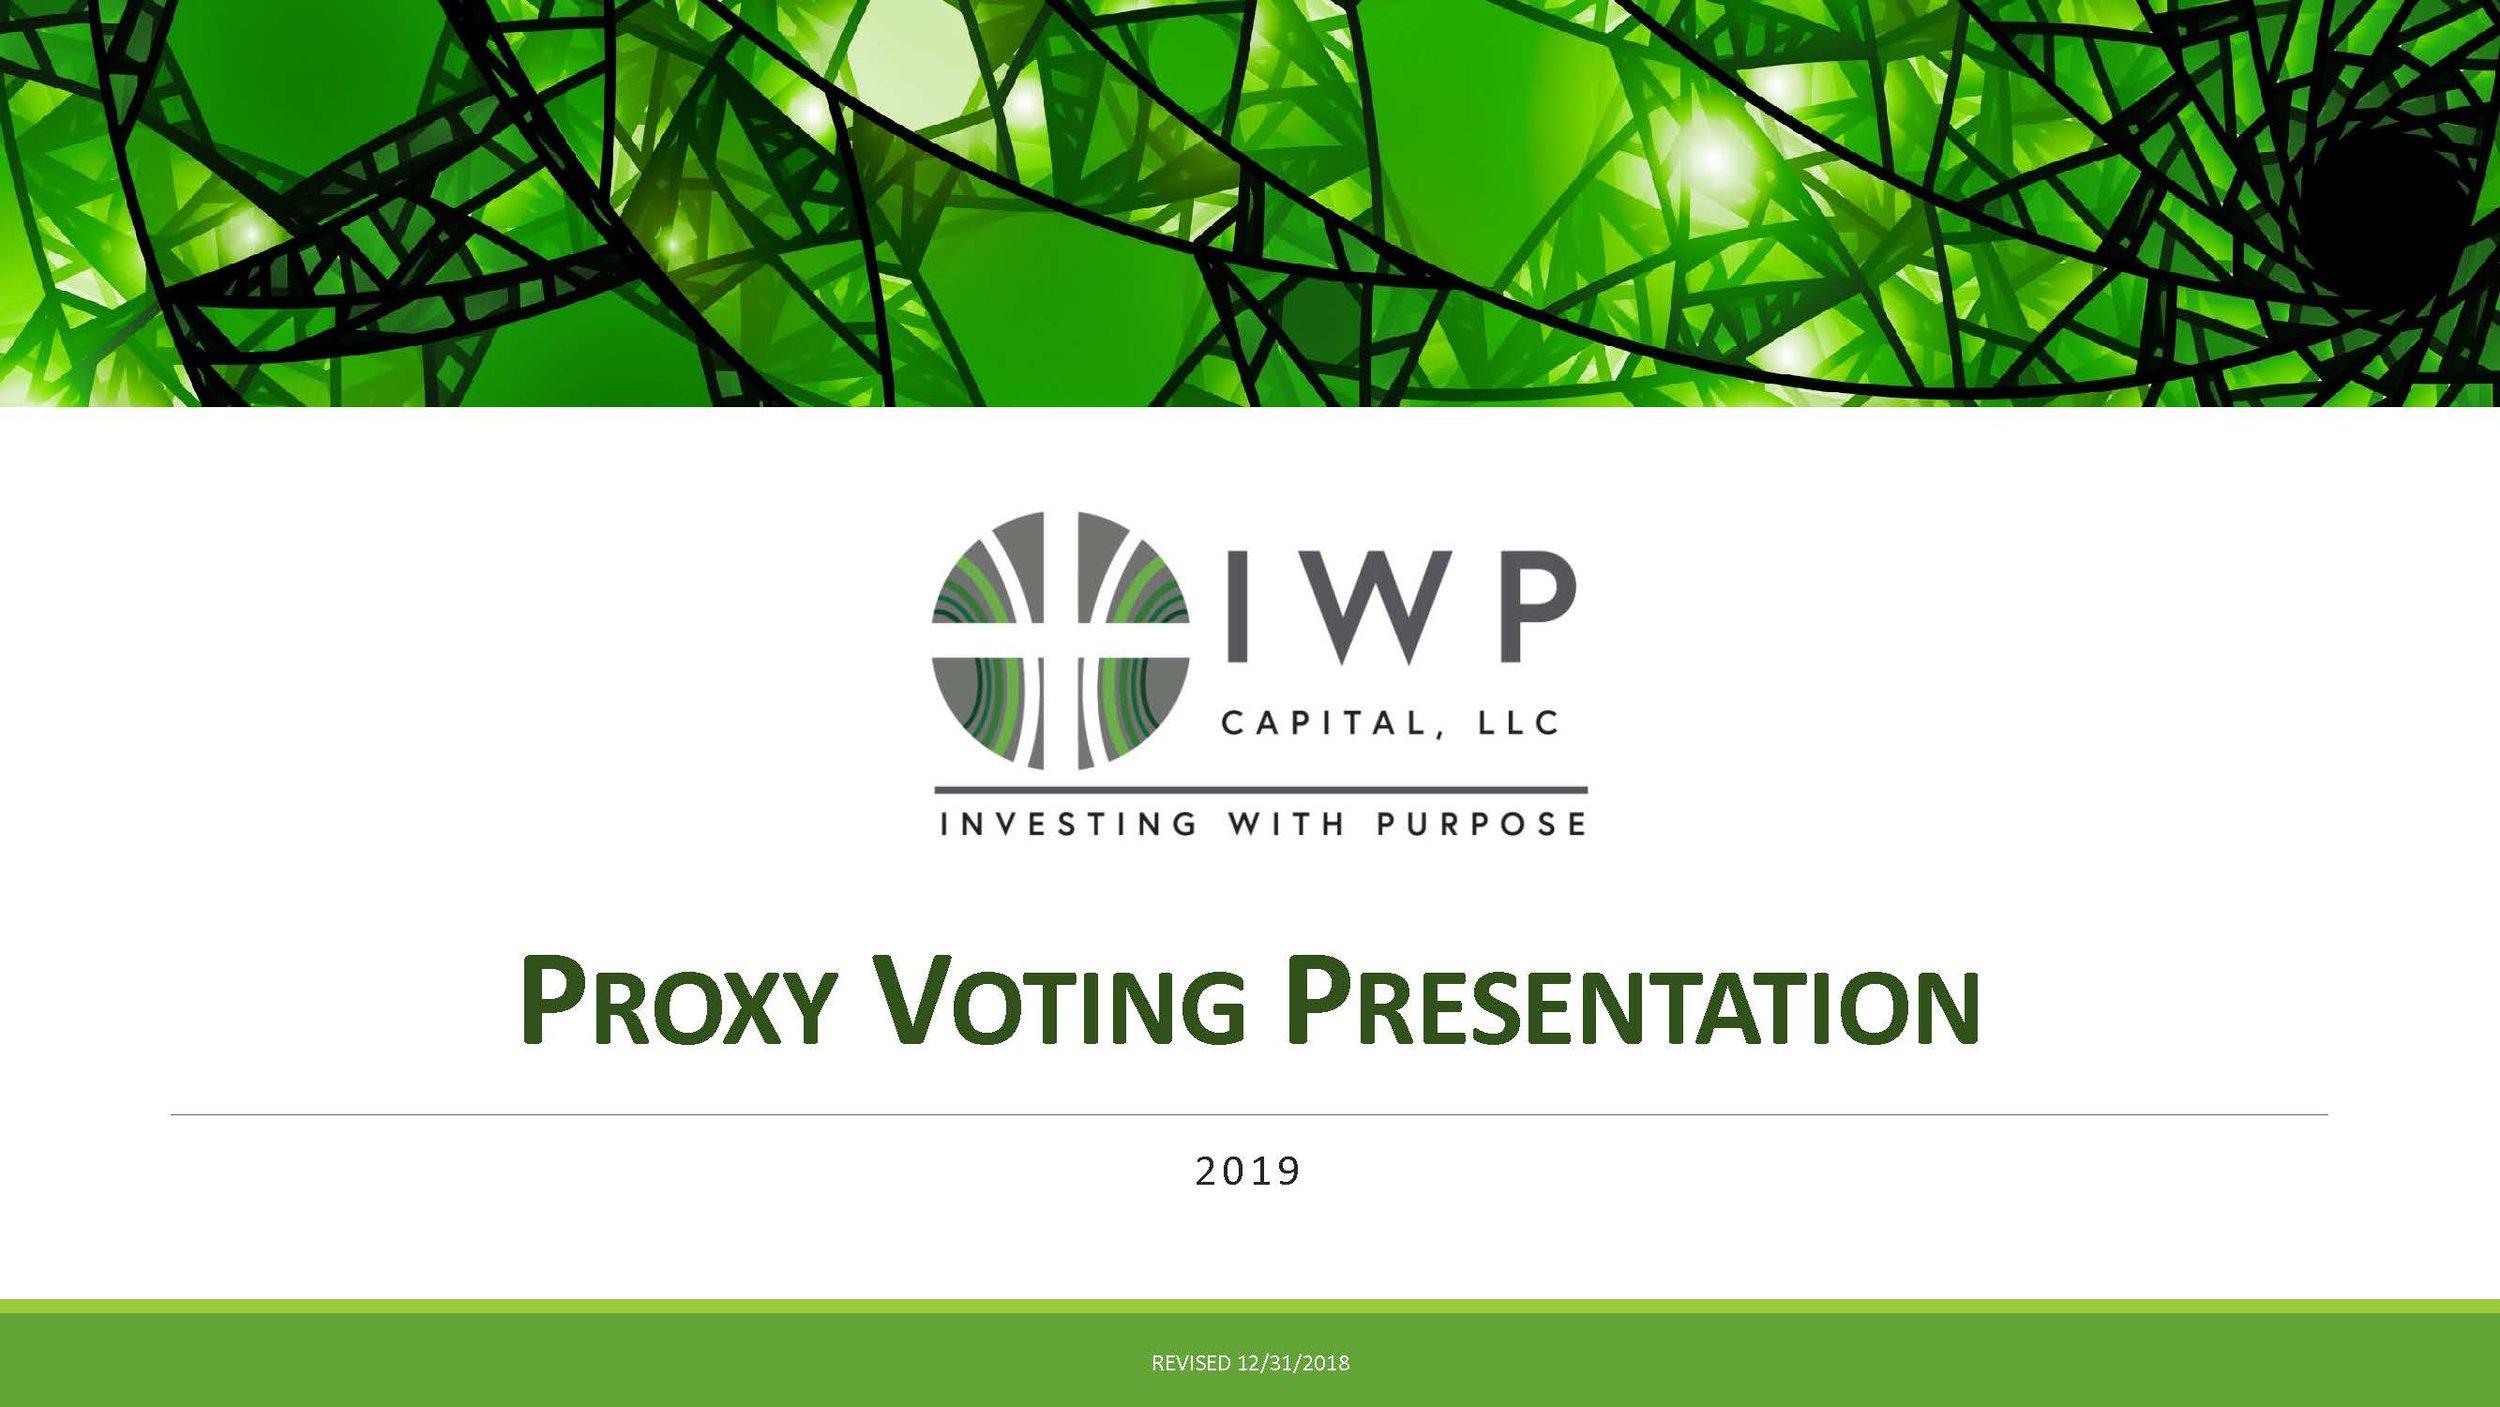 IWP Capital Proxy Voting Presentation (2019)_Page_1.jpg